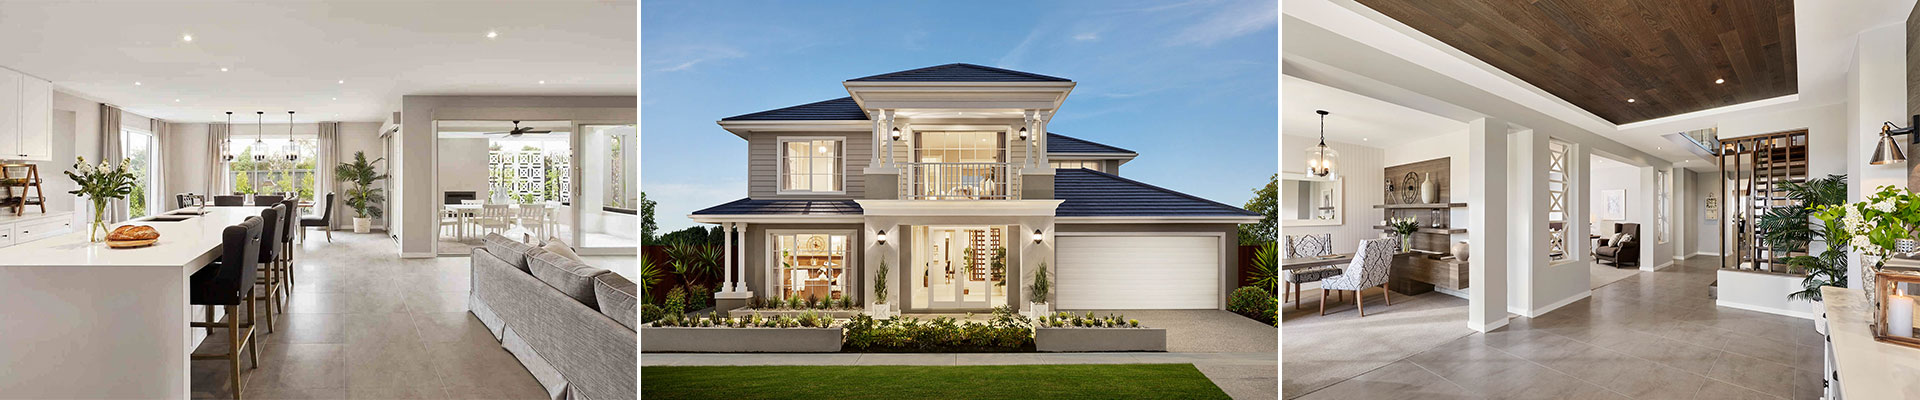 Hamptons style home design.